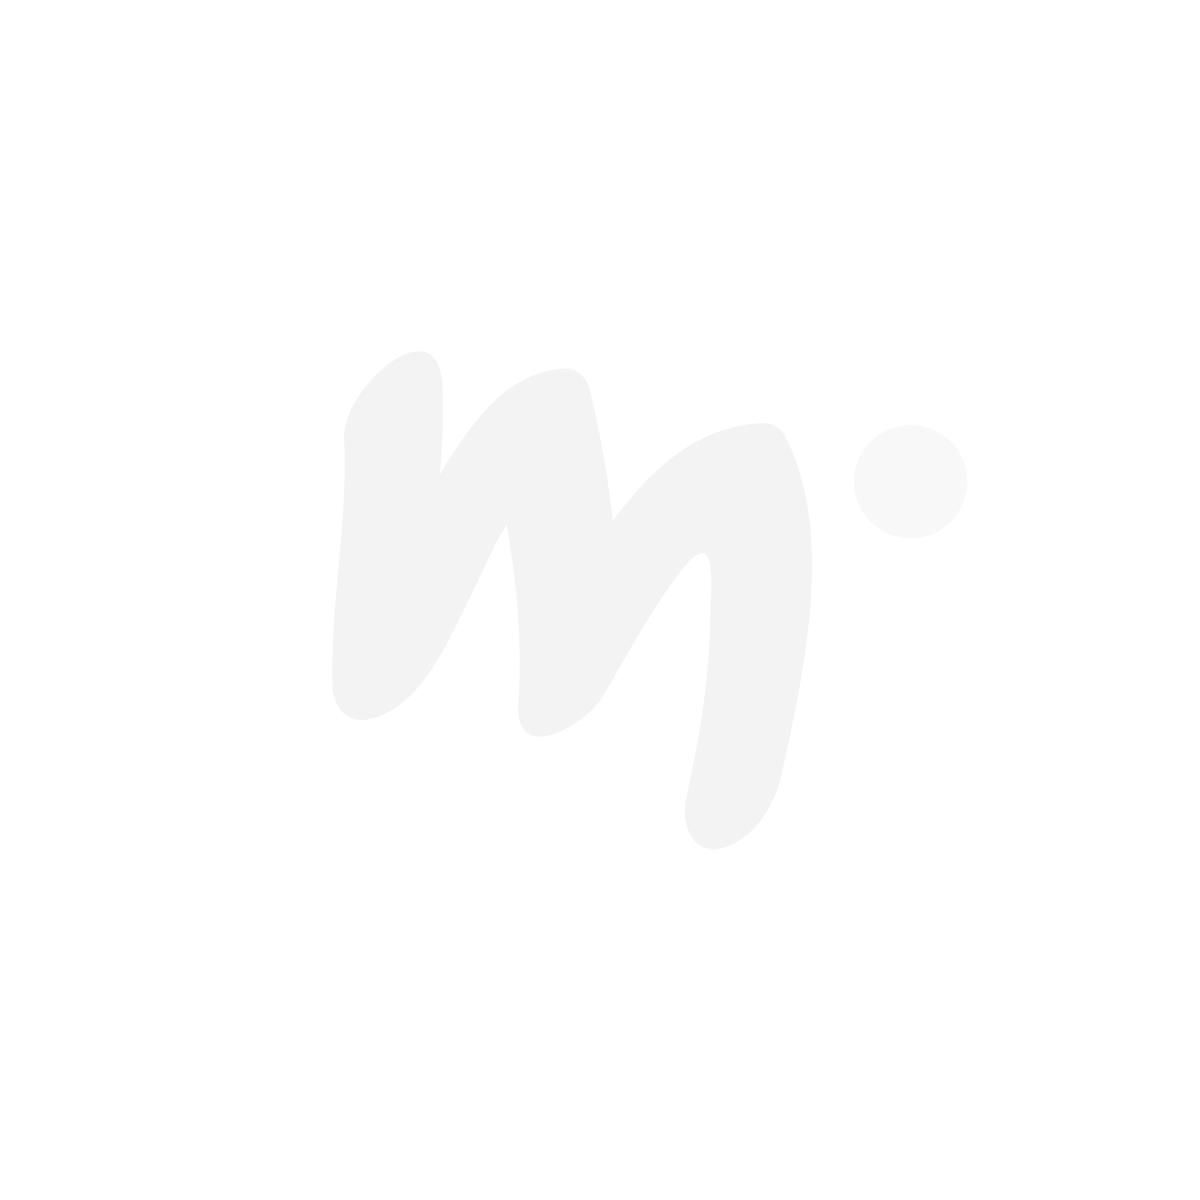 Muumi Sukellus-uimapuku punainen